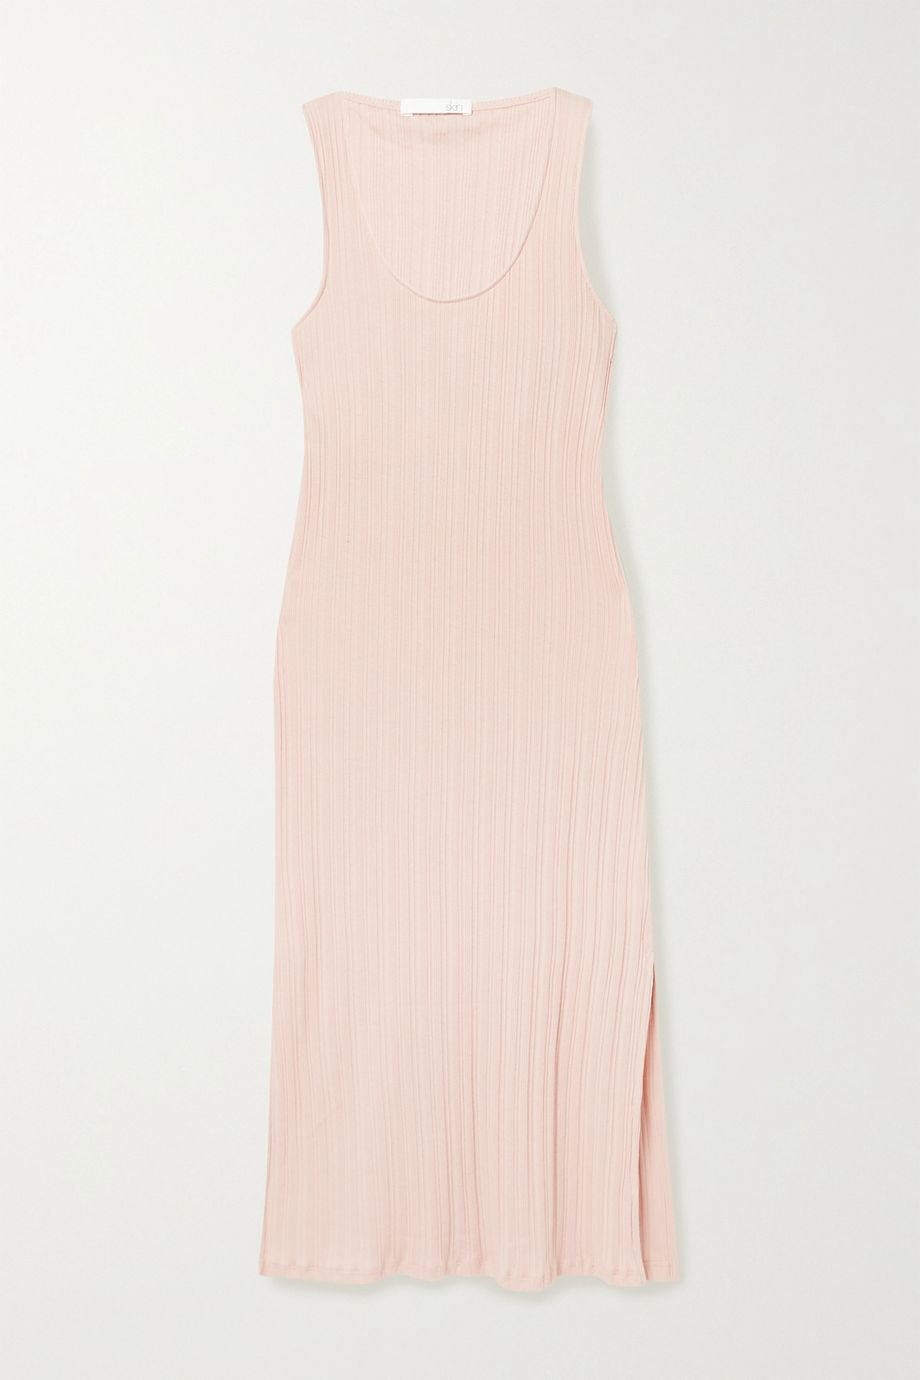 Skin Rozlyn Nachthemd aus geripptem Pima-Baumwoll-Jersey